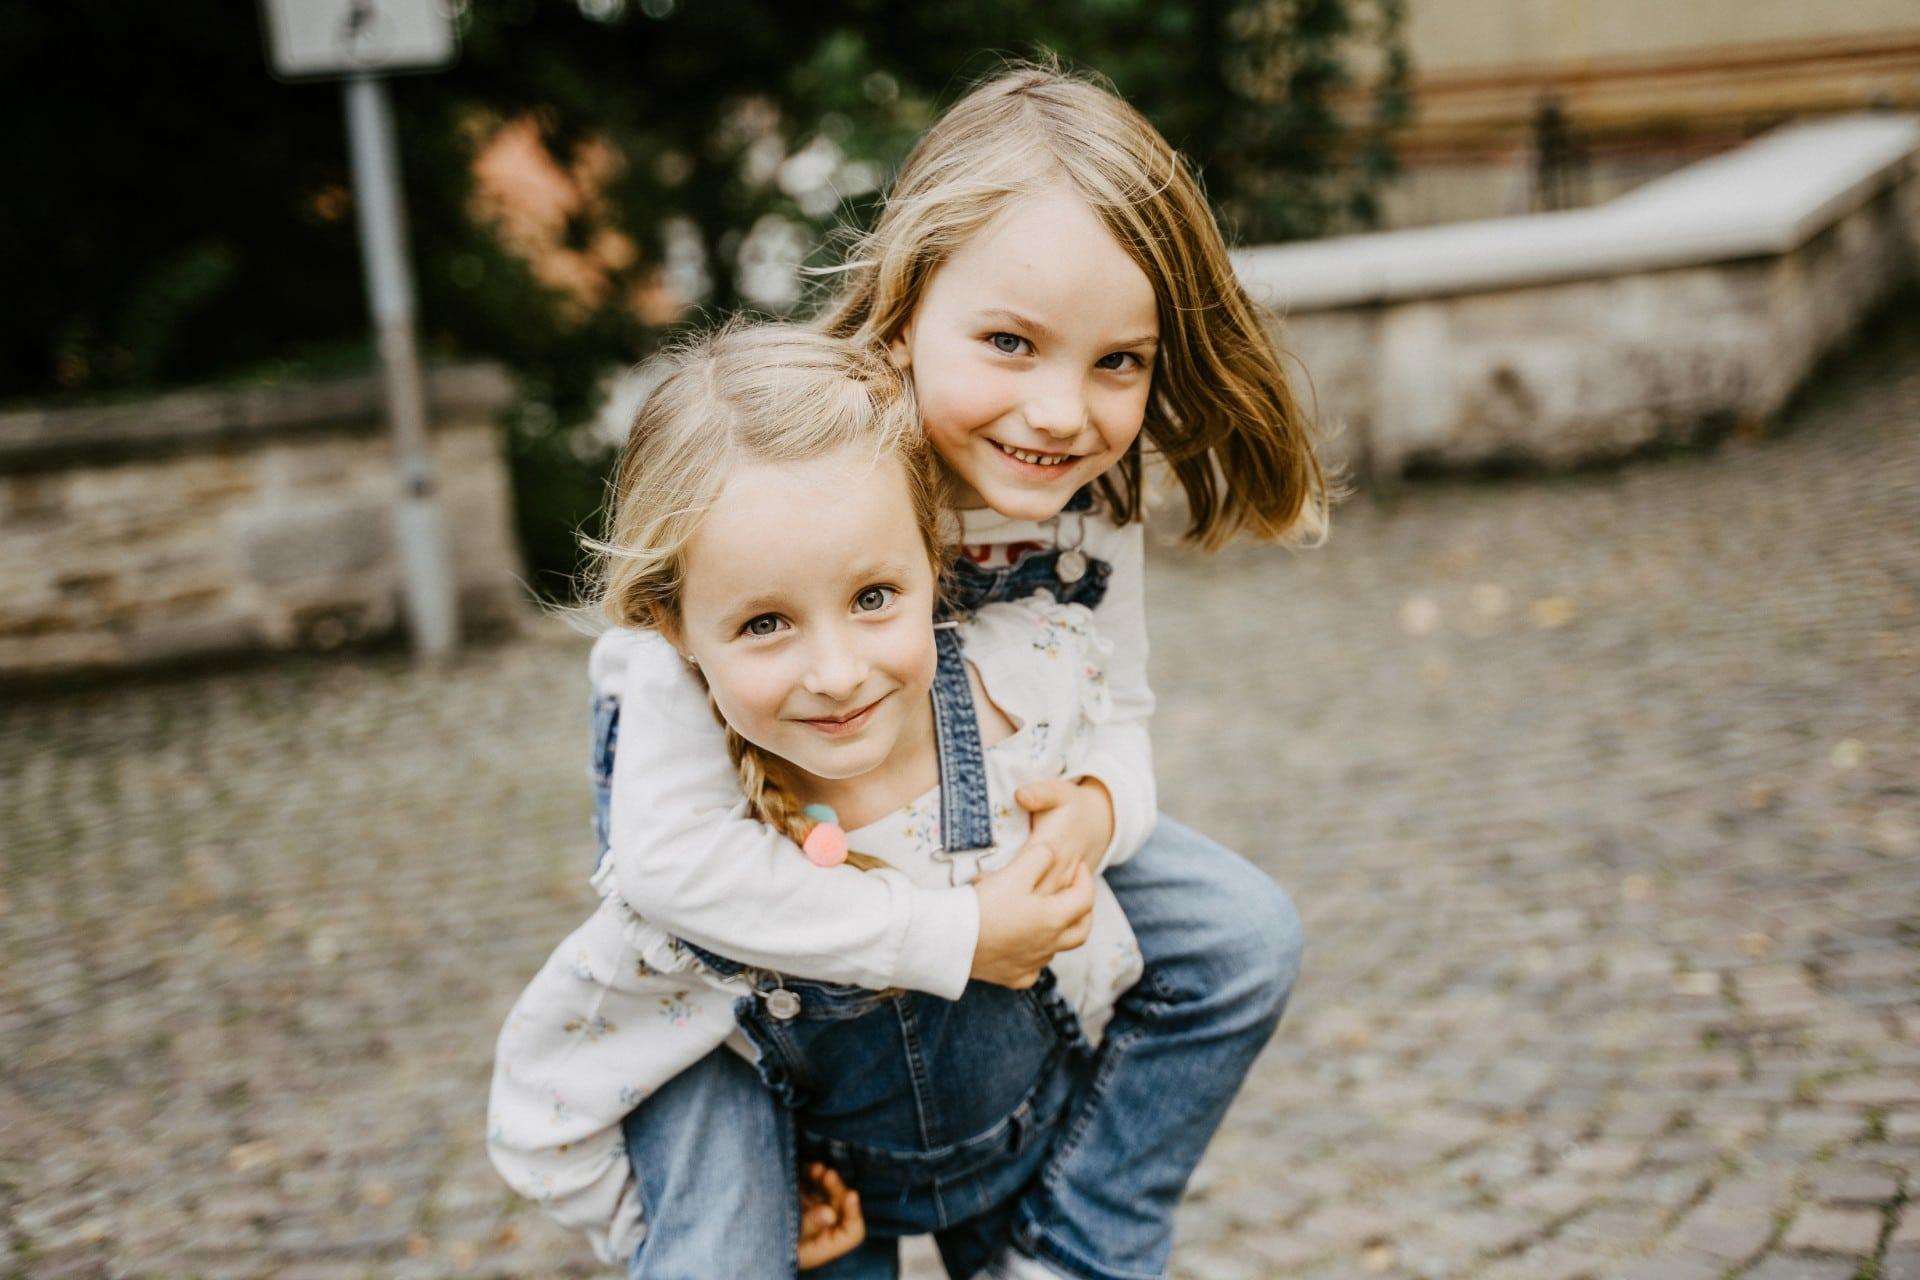 855-Fotostudio-BRENDEL-Familienfotos-RRJIvtQG